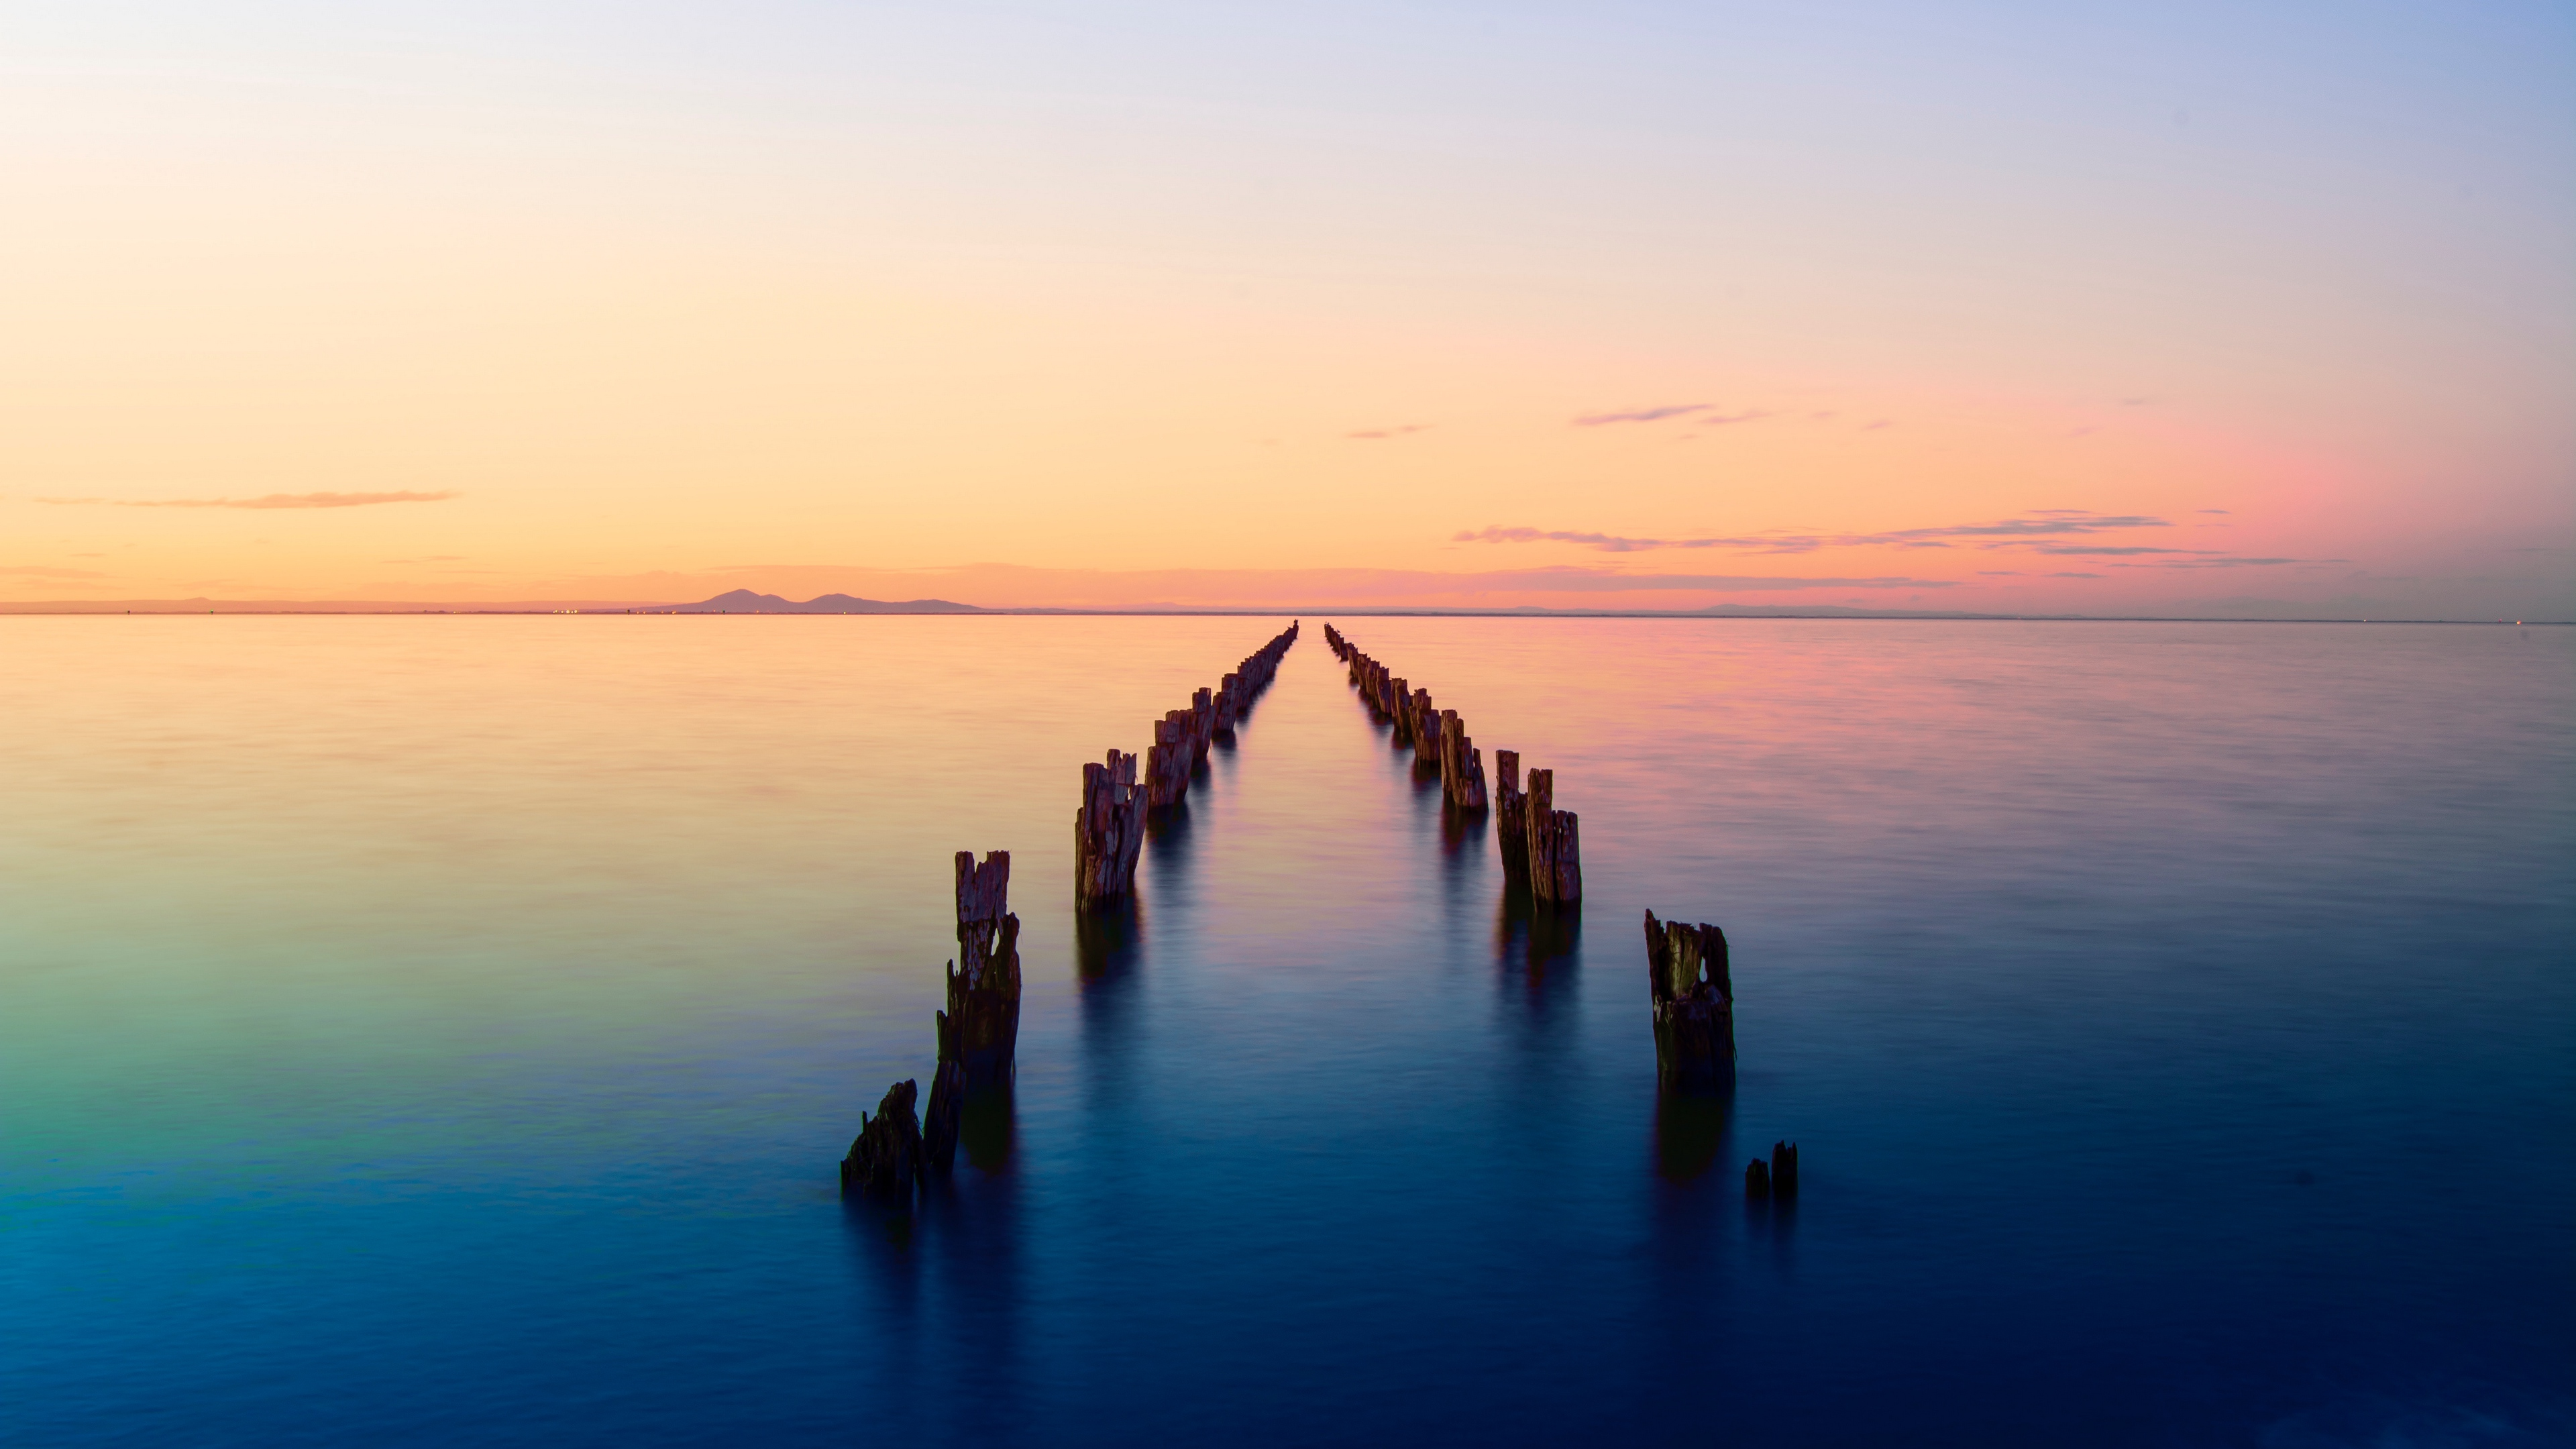 bay horizon sunset pier ruins clifton springs australia 4k 1541116669 - bay, horizon, sunset, pier, ruins, clifton springs, australia 4k - sunset, Horizon, Bay